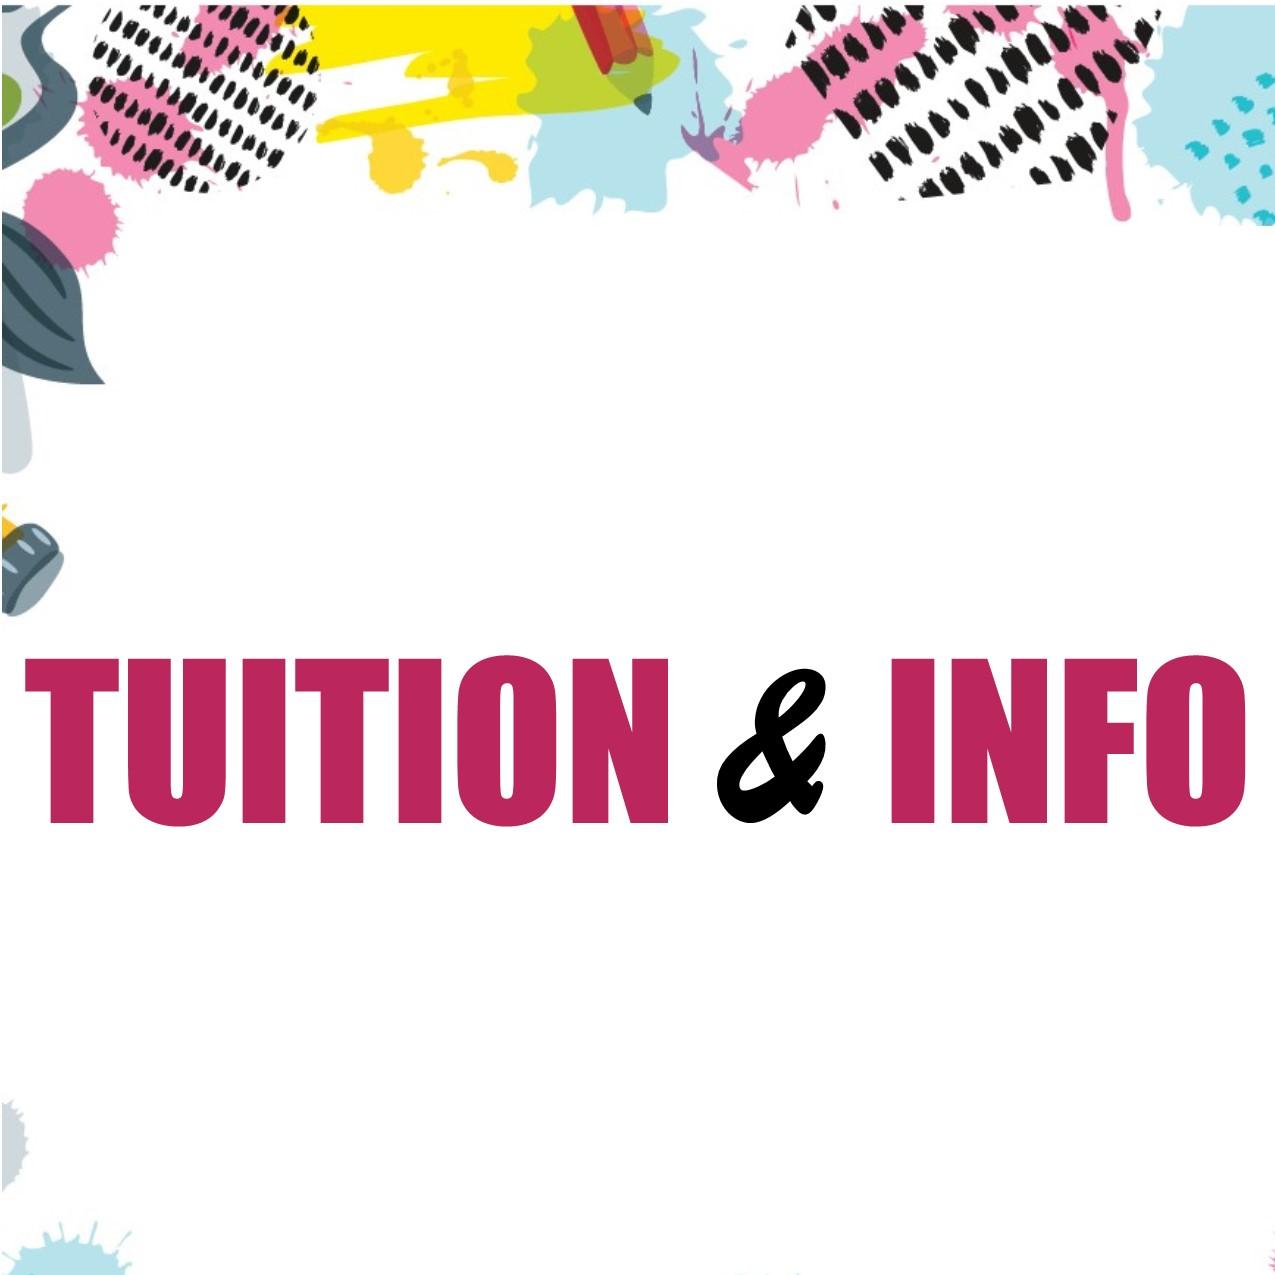 Tuition.jpg